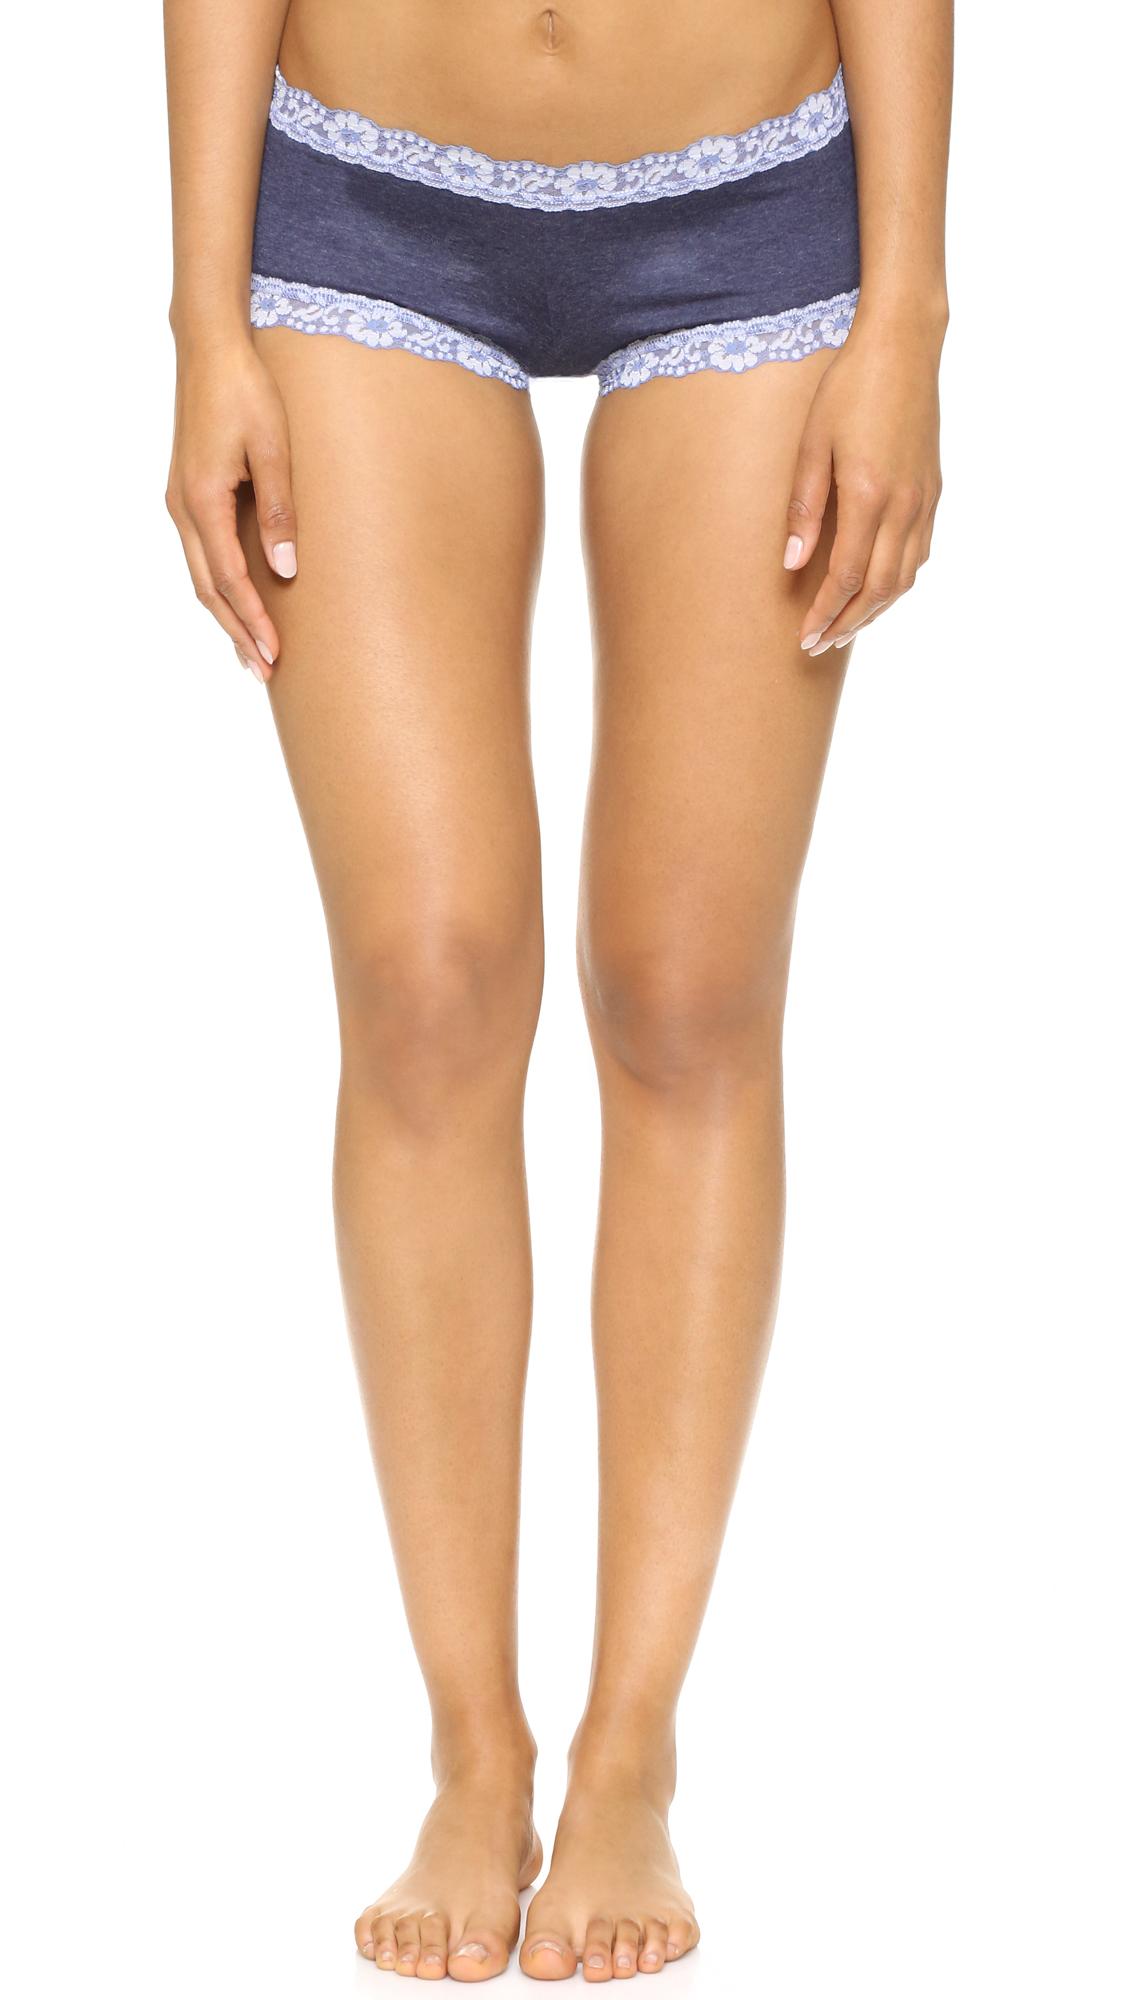 Hanky Panky Heather Jersey Boy Shorts - Chambray/White at Shopbop